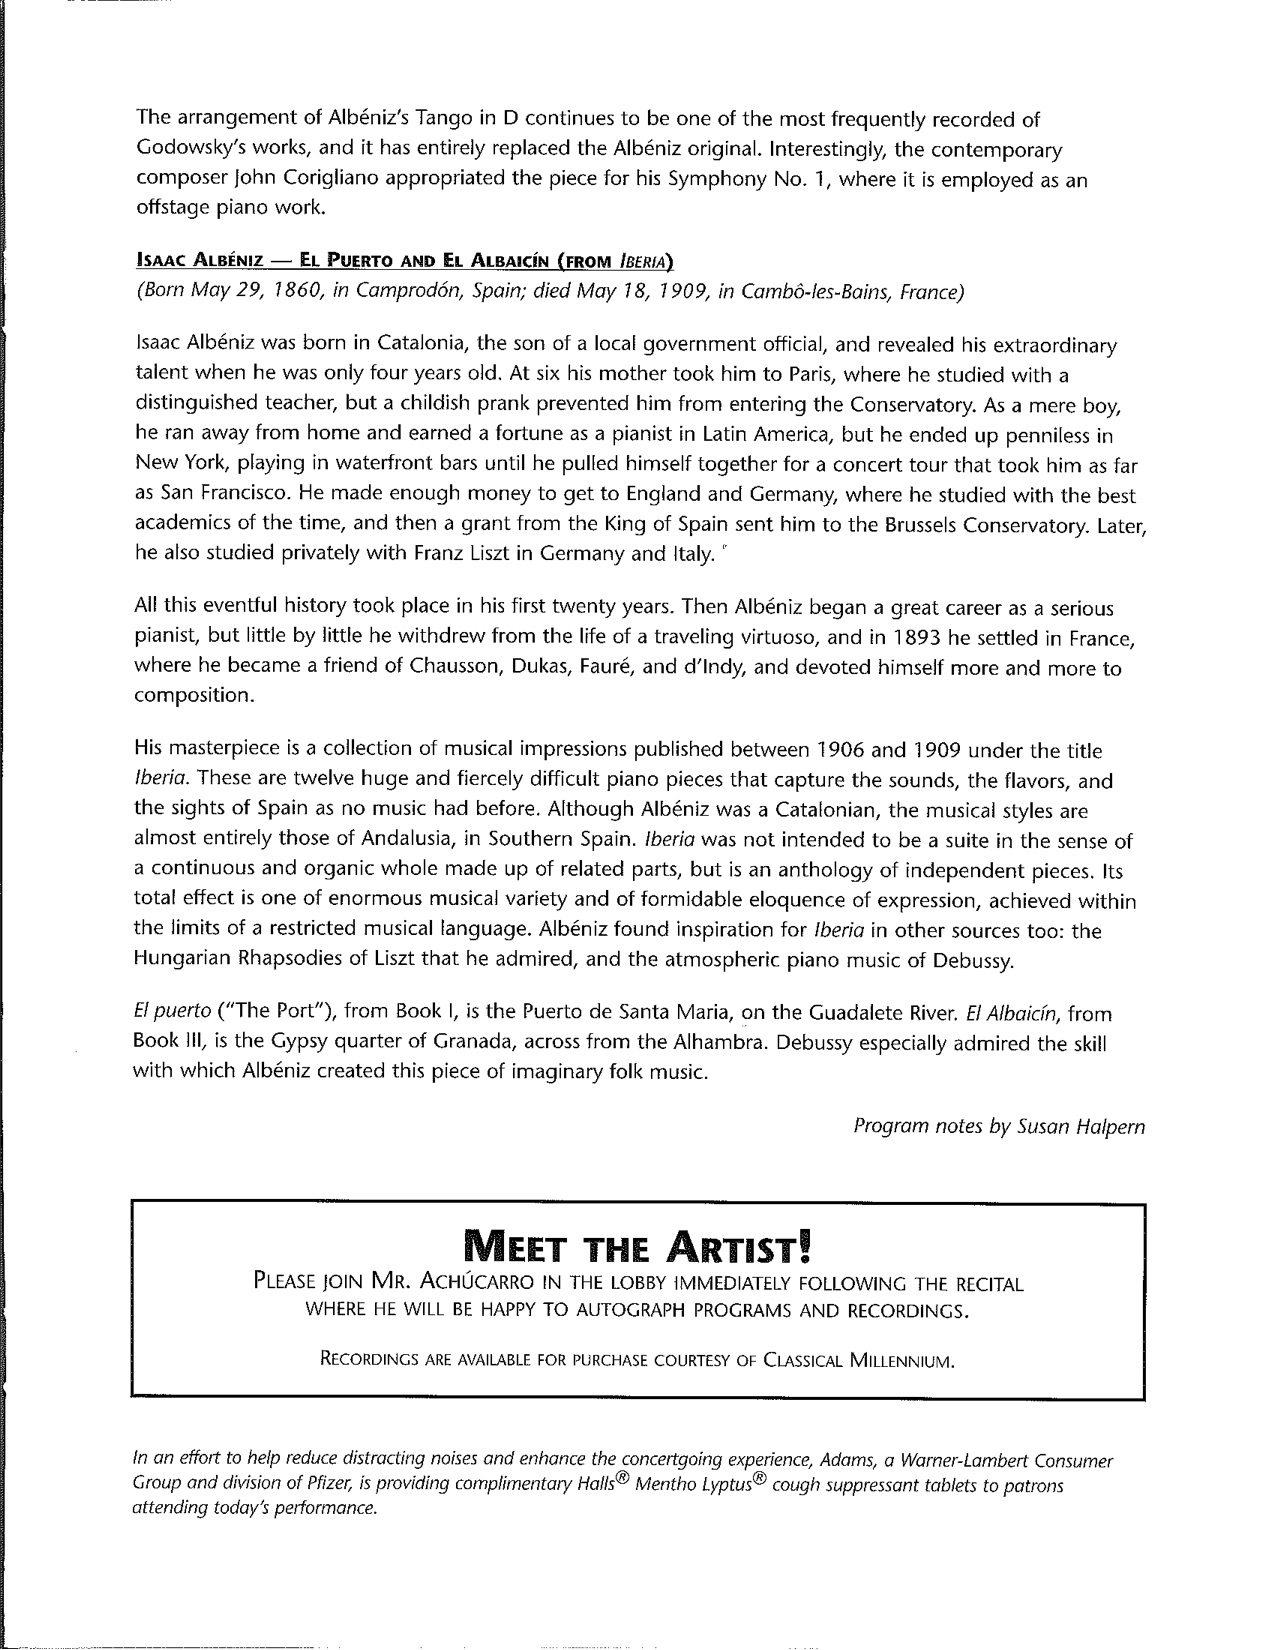 Achucarro02-03_Program8.jpg